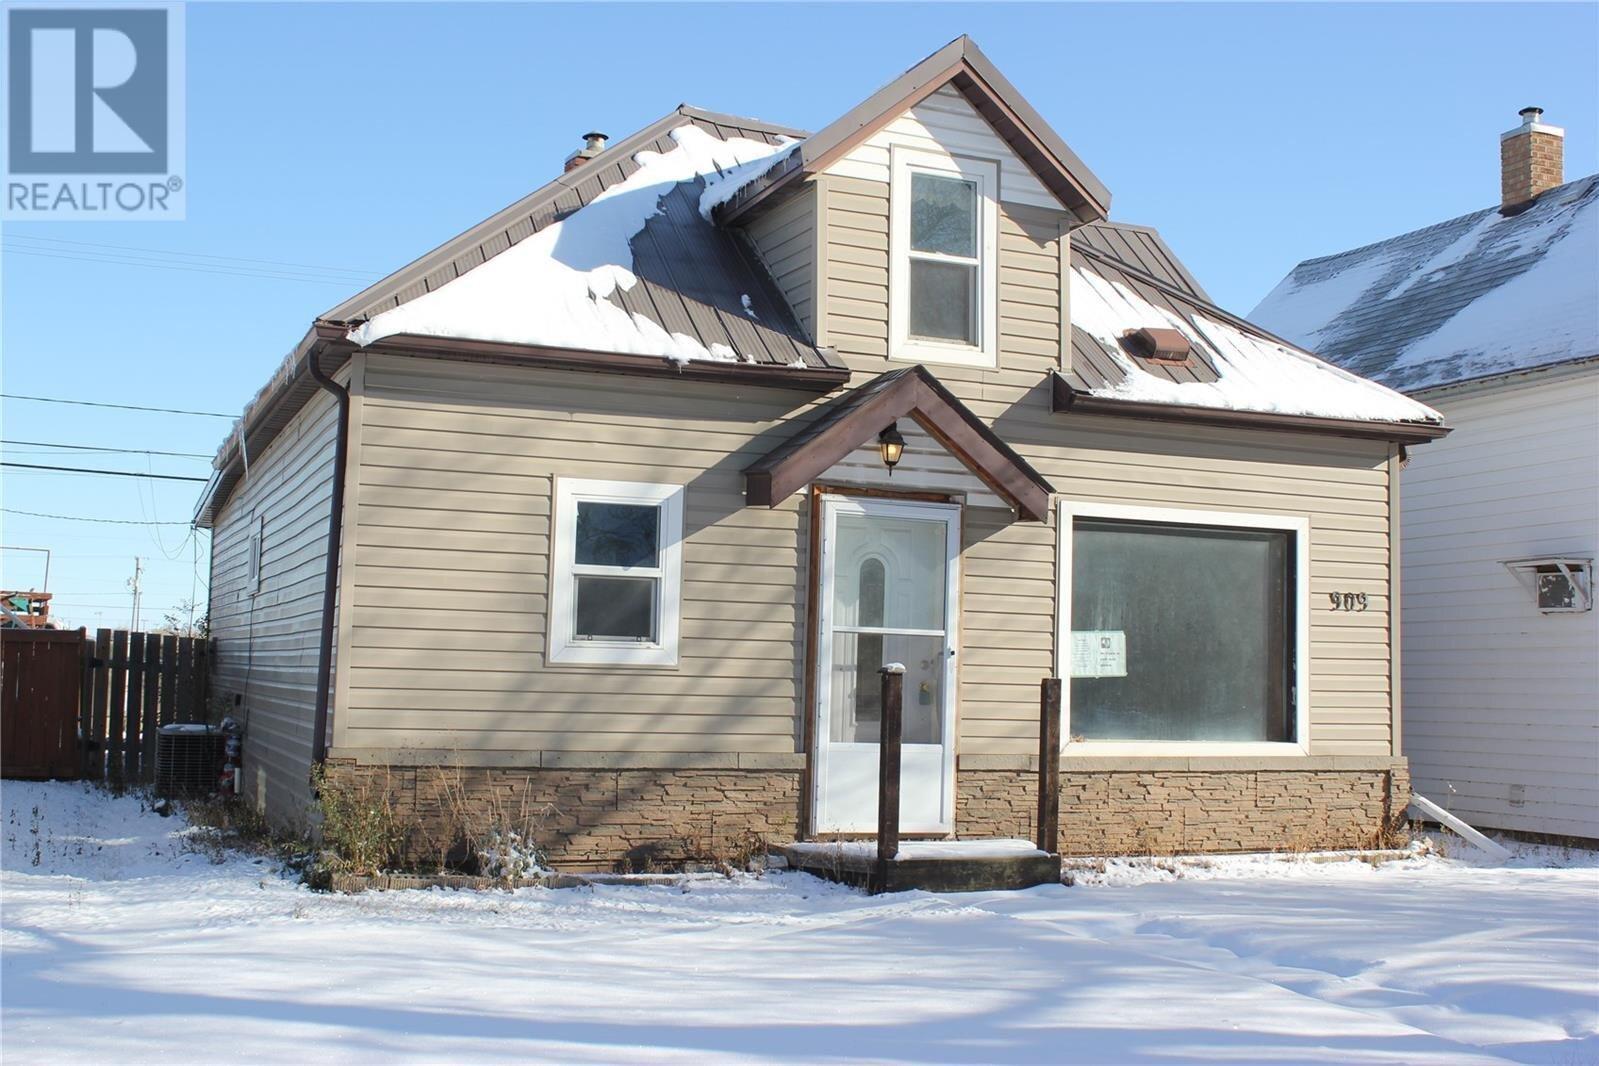 House for sale at 909 4th St Estevan Saskatchewan - MLS: SK831241